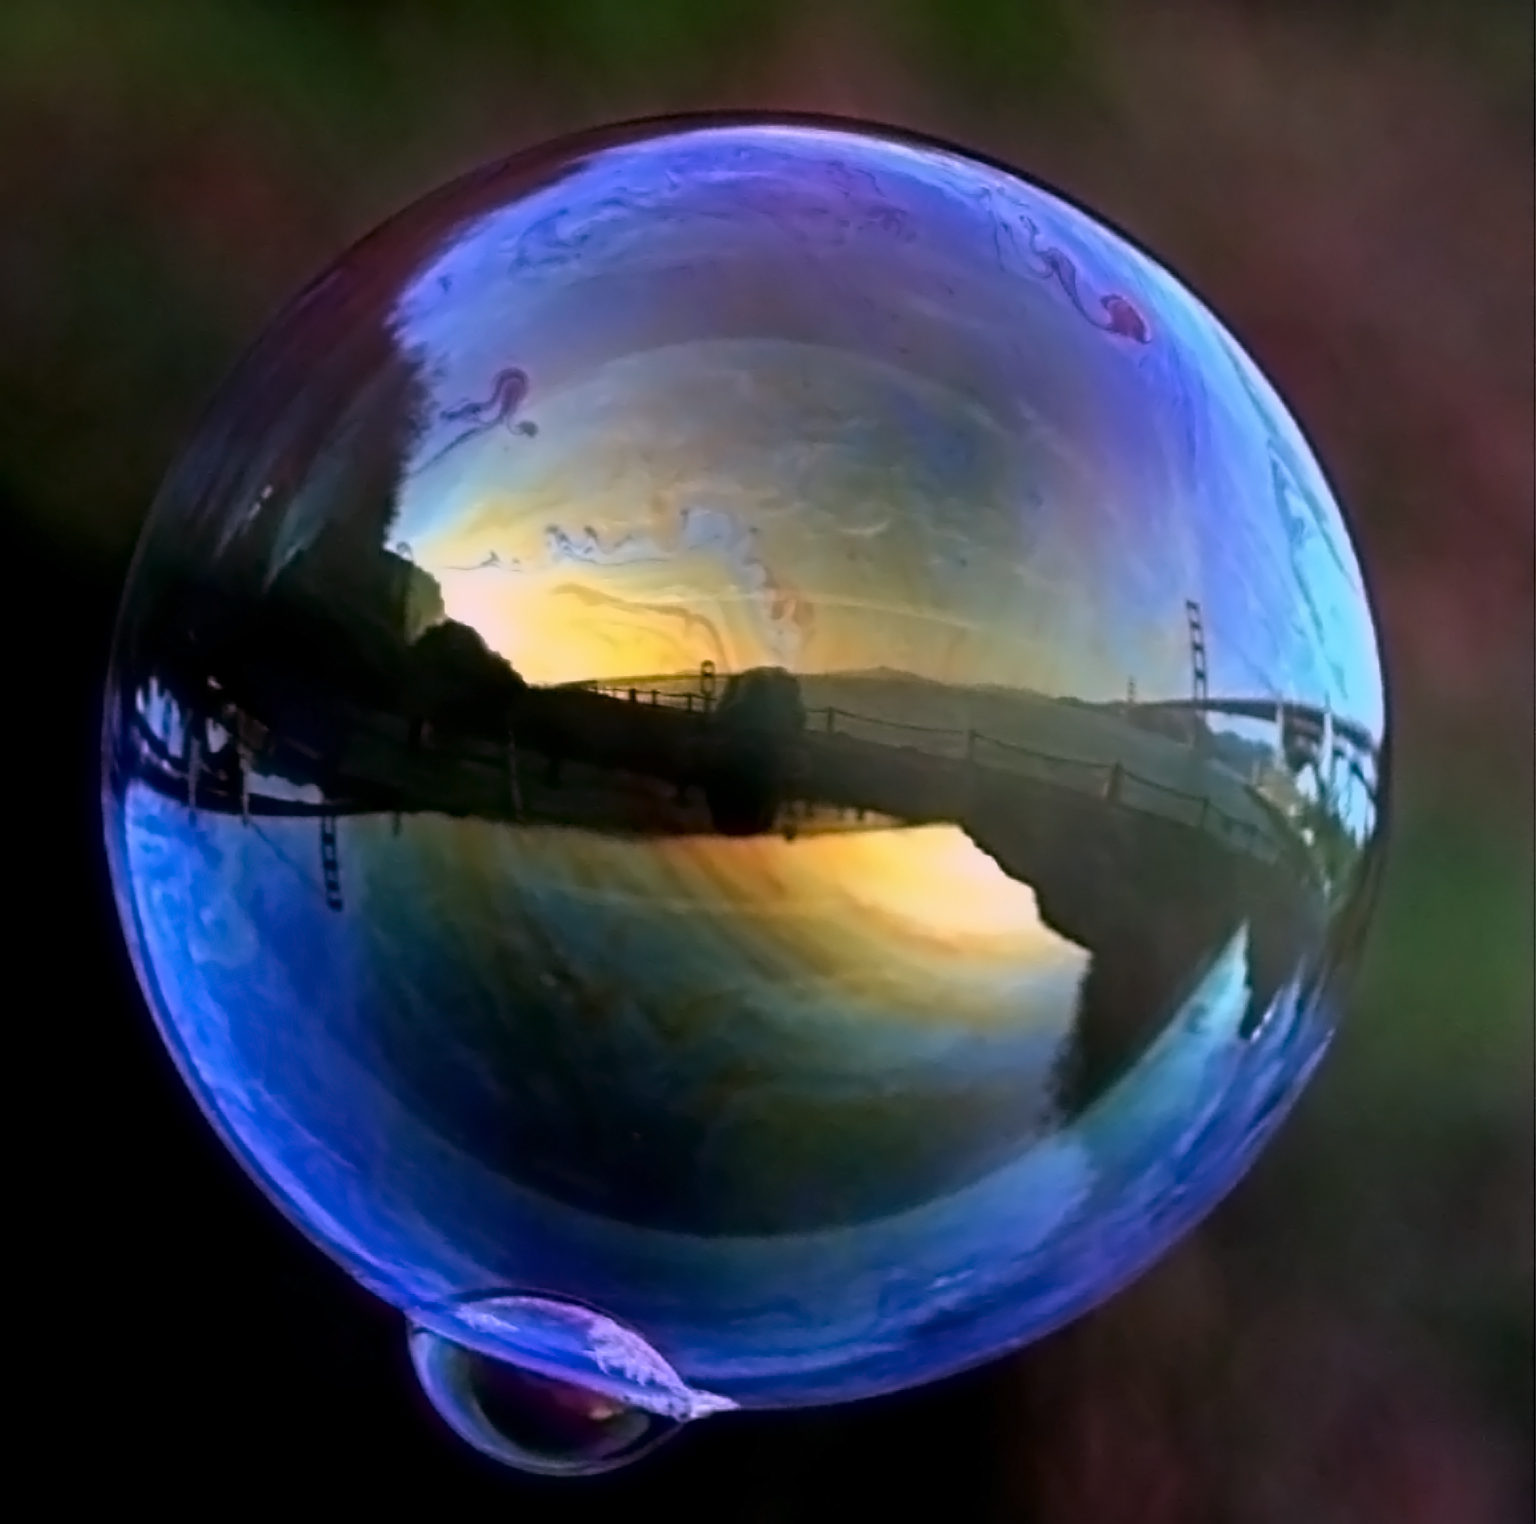 Golden Gate Bridge is reflected in a soap bubble